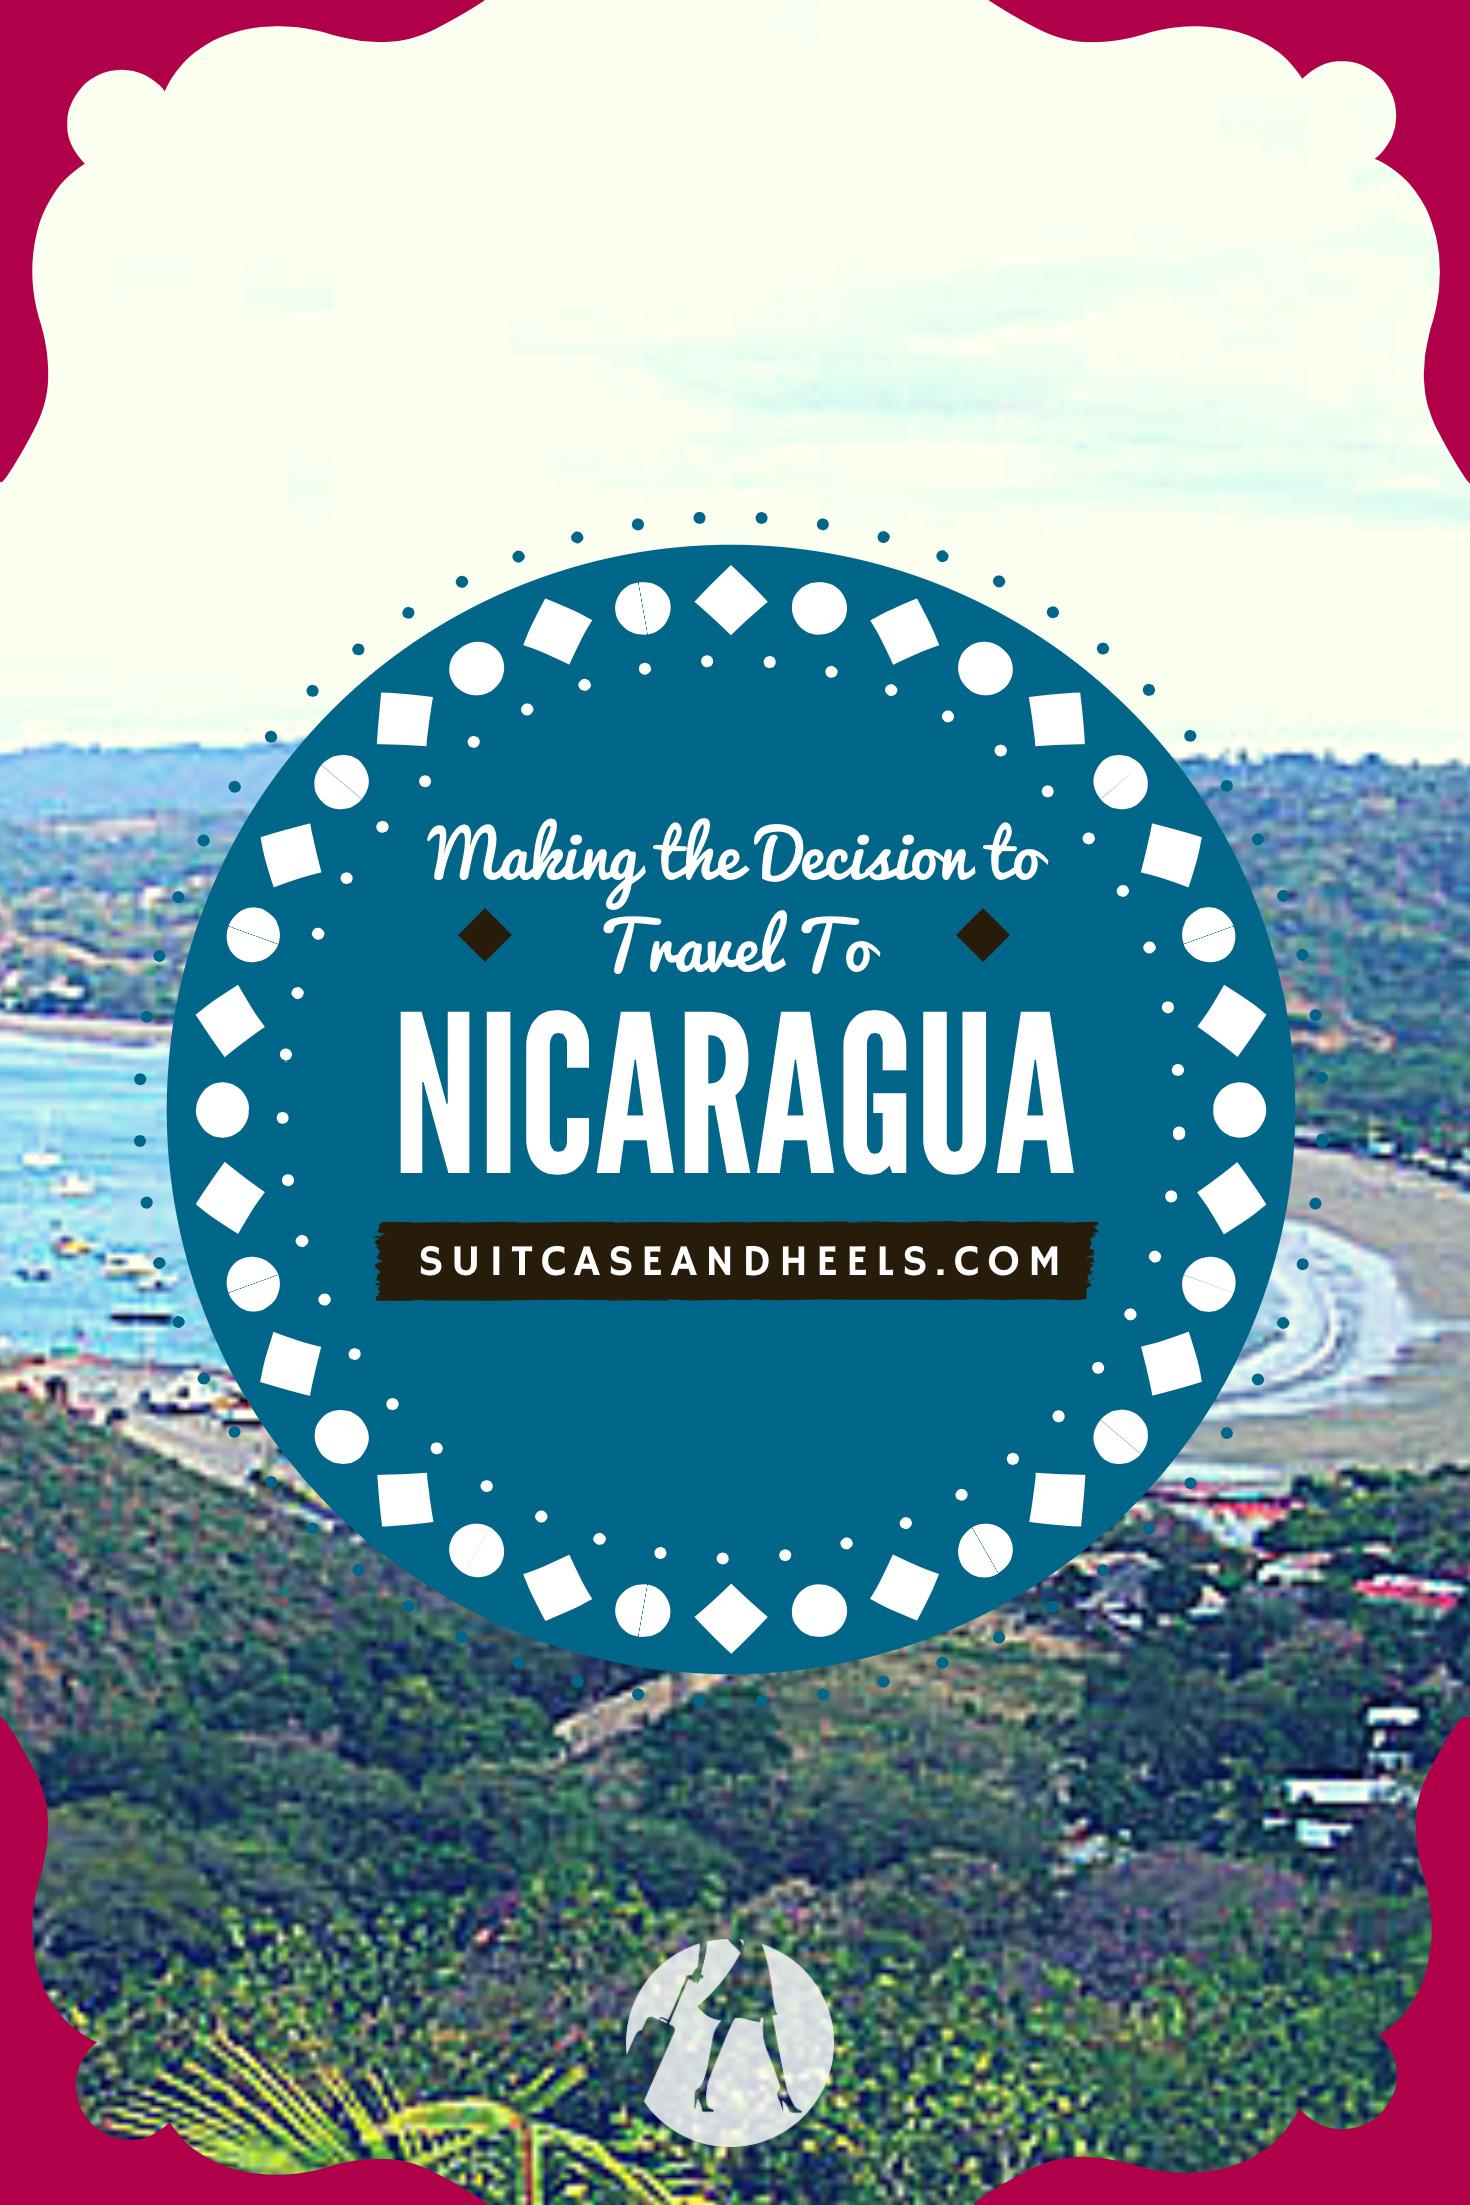 Travel to Nicaragua | SuitcaseandHeels.com